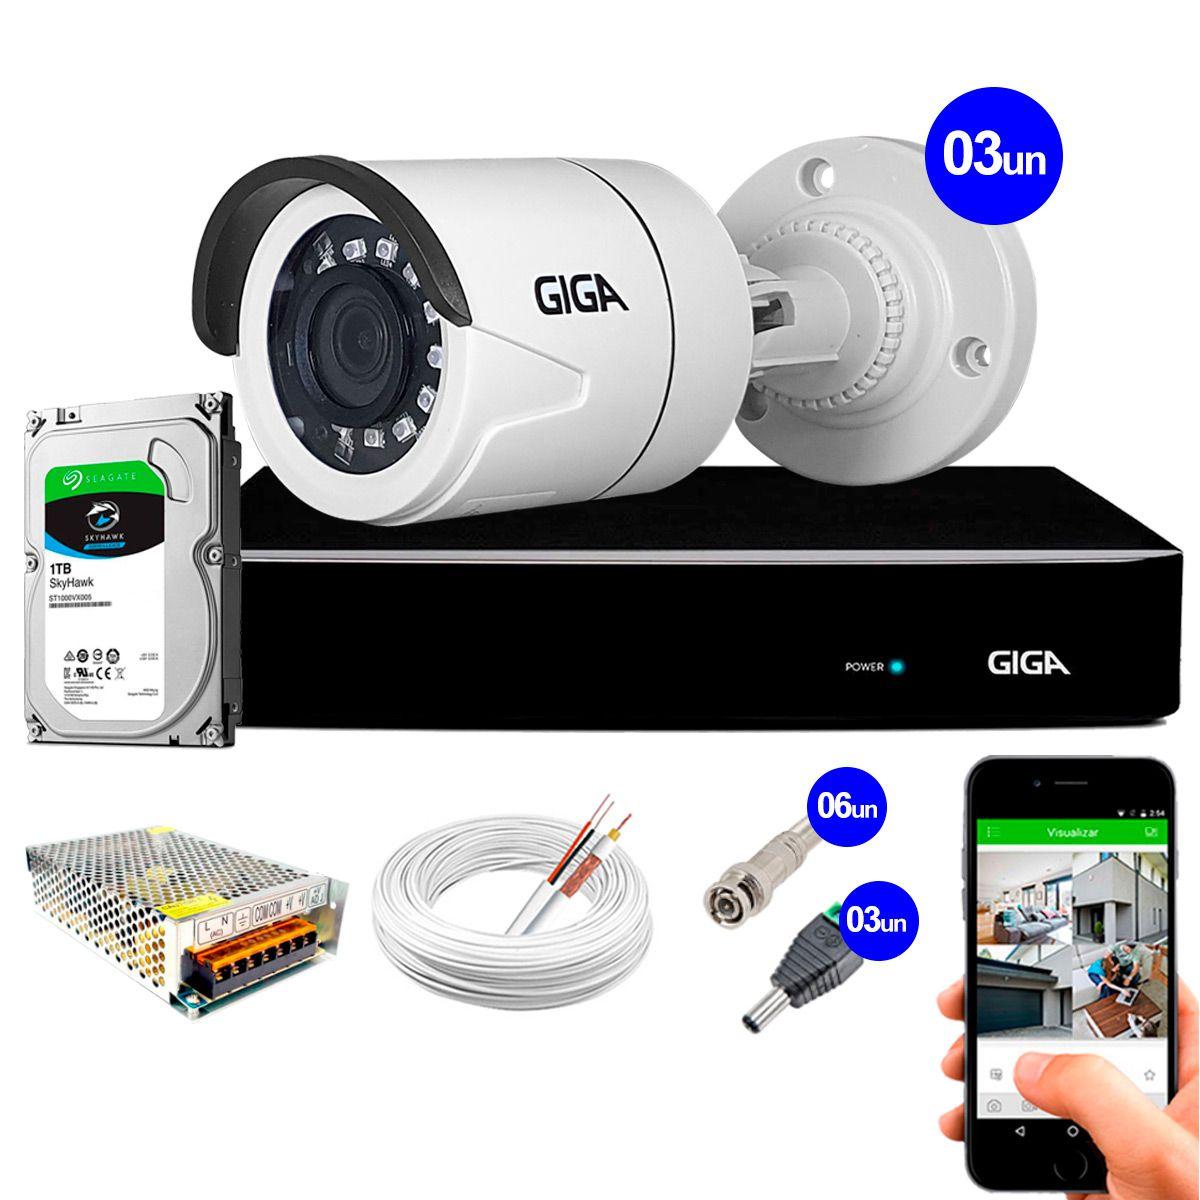 Kit Super Starvis Full HD 1080p 03 Câmeras GS0055 + DVR Giga Security + HD 1TB Skyhawk + Acessórios  - Tudo Forte